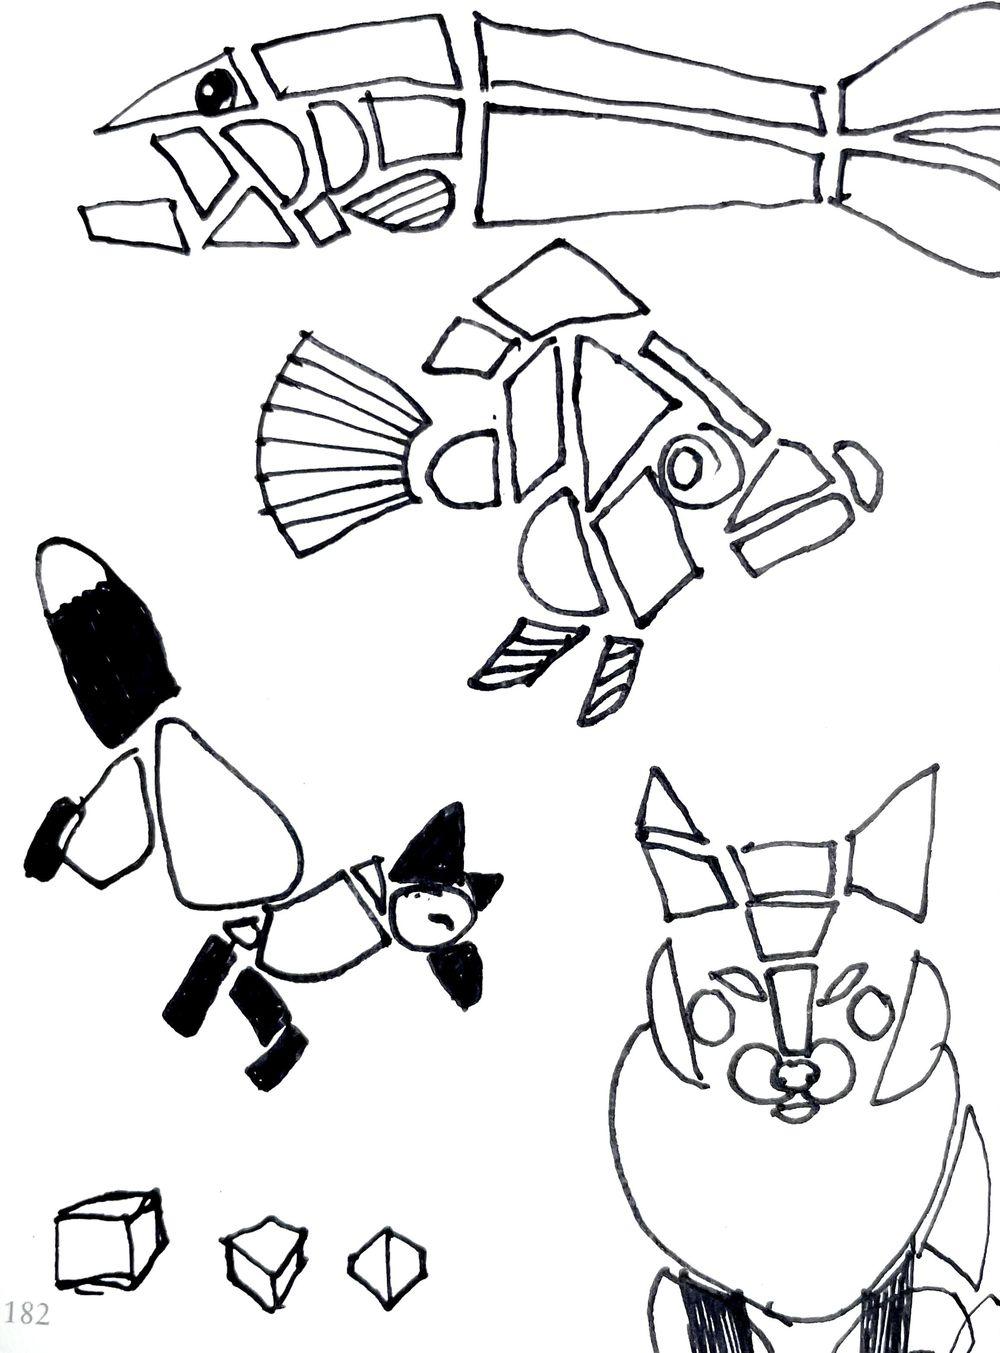 Animal illustrations - image 3 - student project